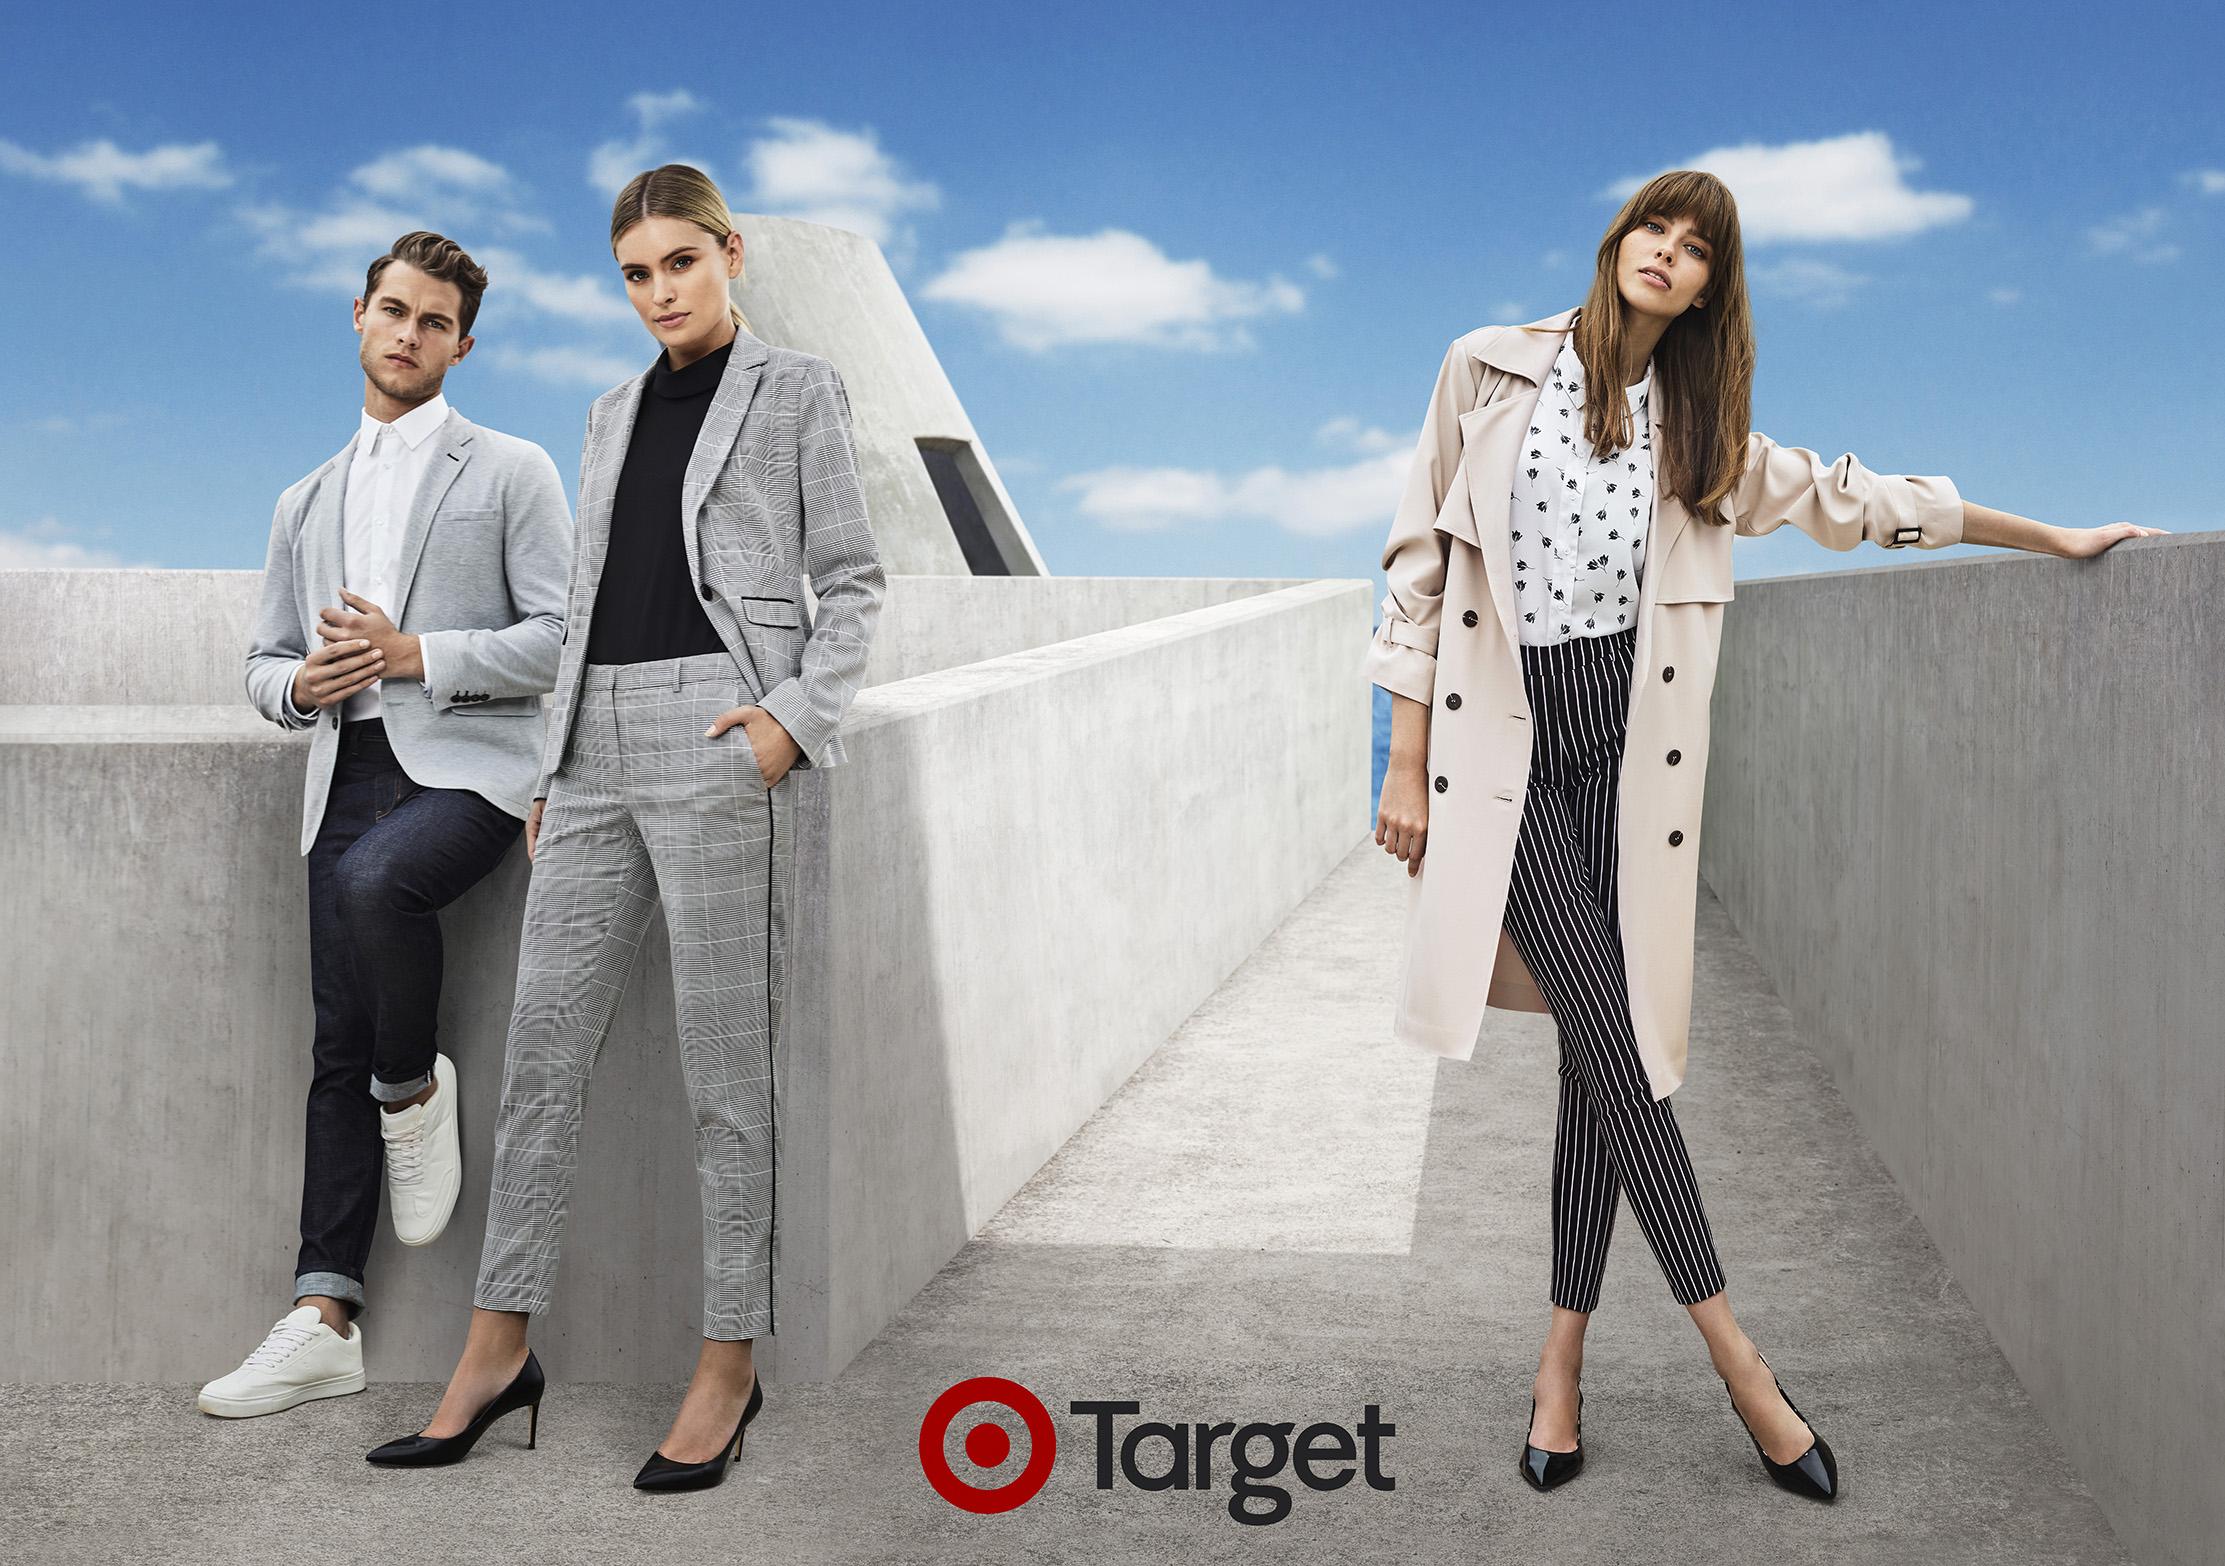 AMarr_Target.jpg